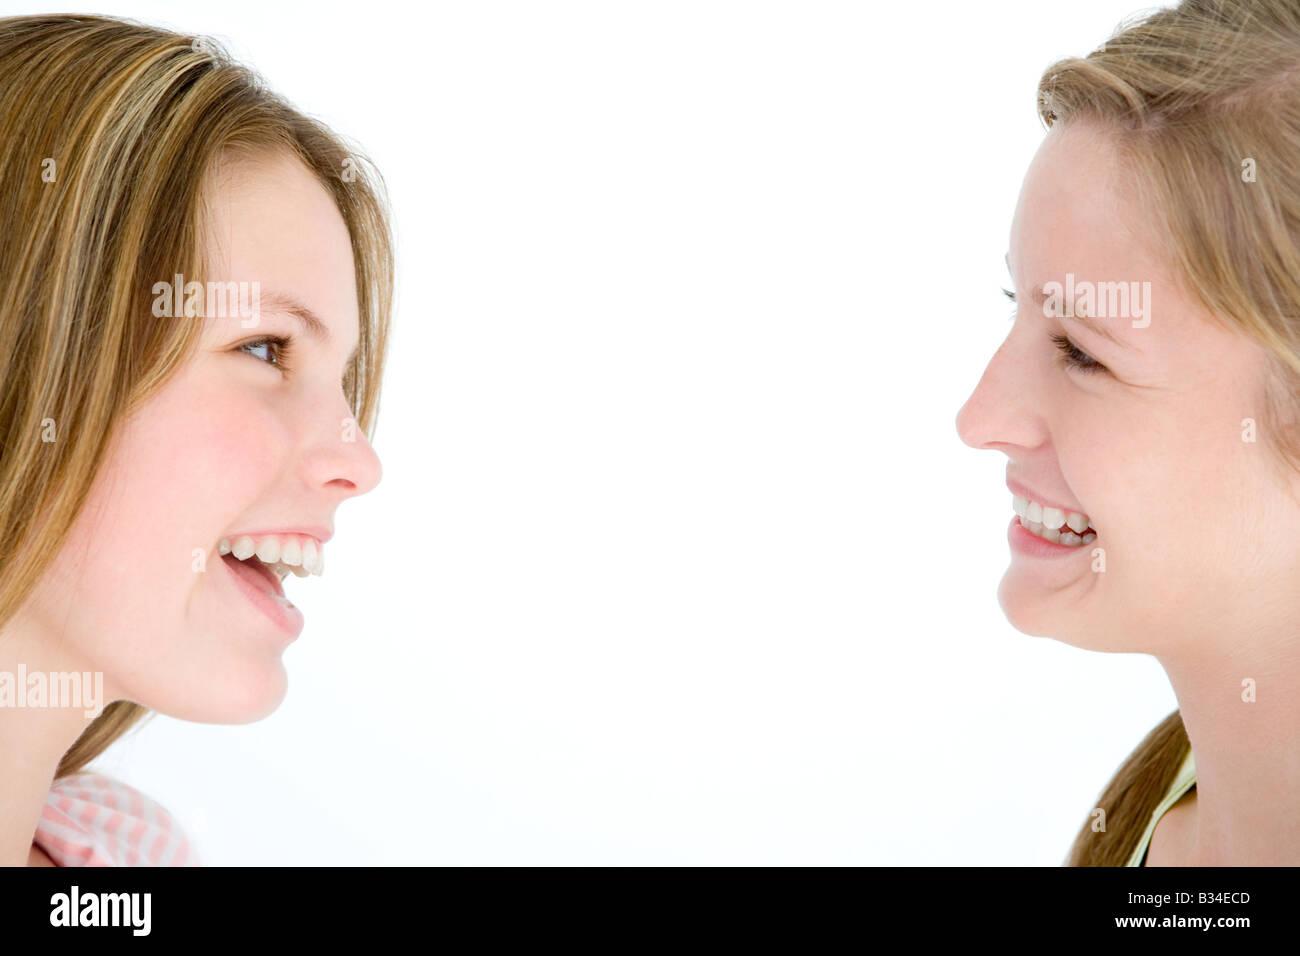 Deux amies se regarder smiling Photo Stock